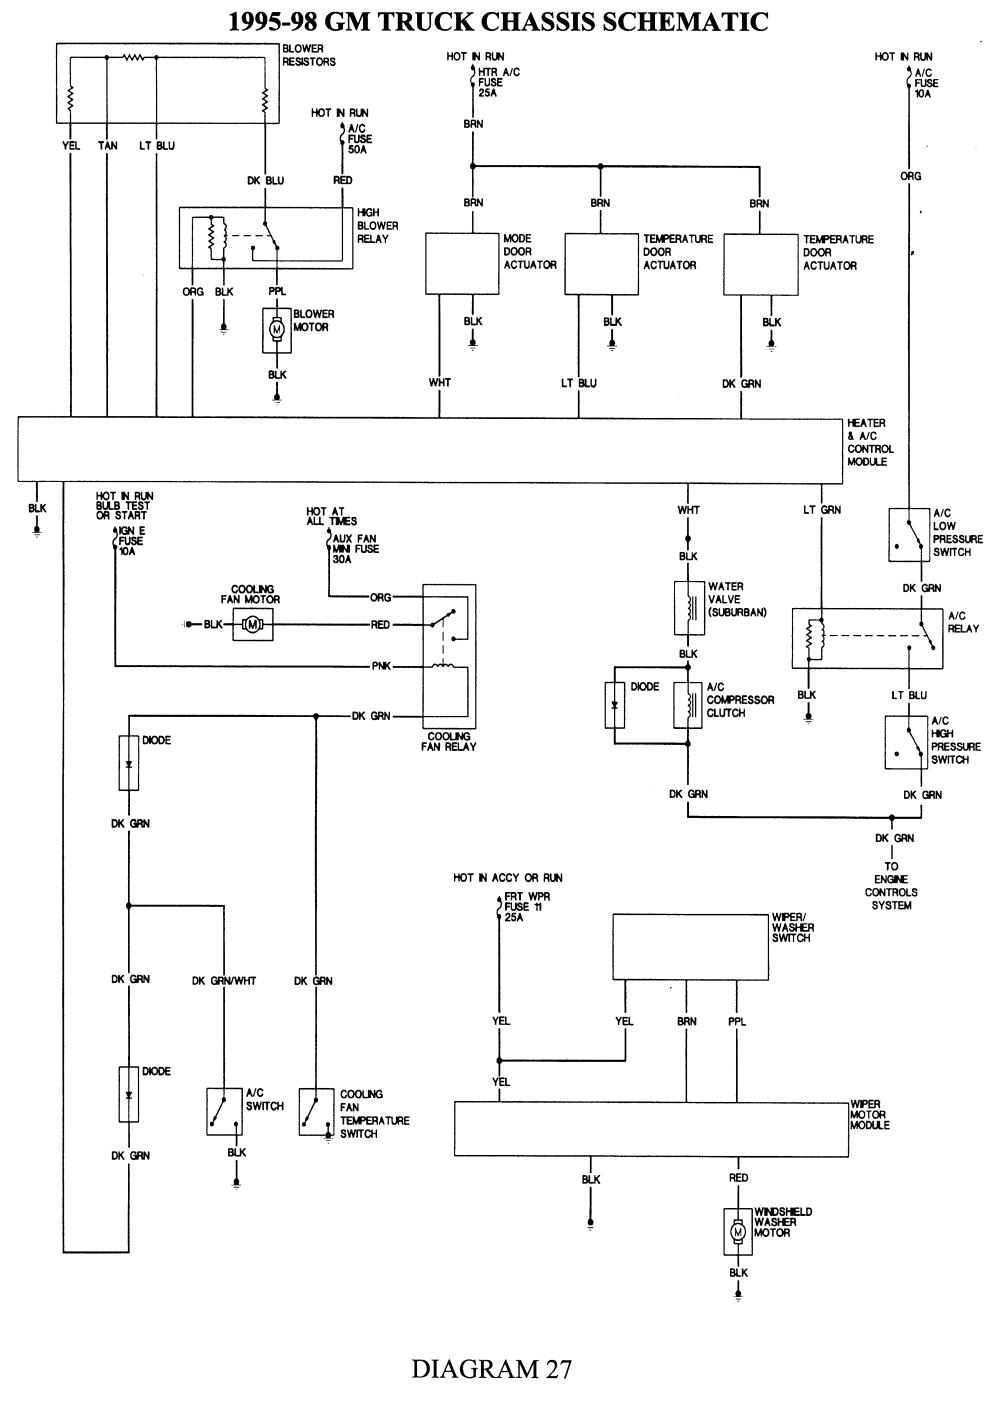 1991 Chevy Truck Wiring Diagram Repair Guides Wiring Diagrams Wiring Diagrams Autozone Com